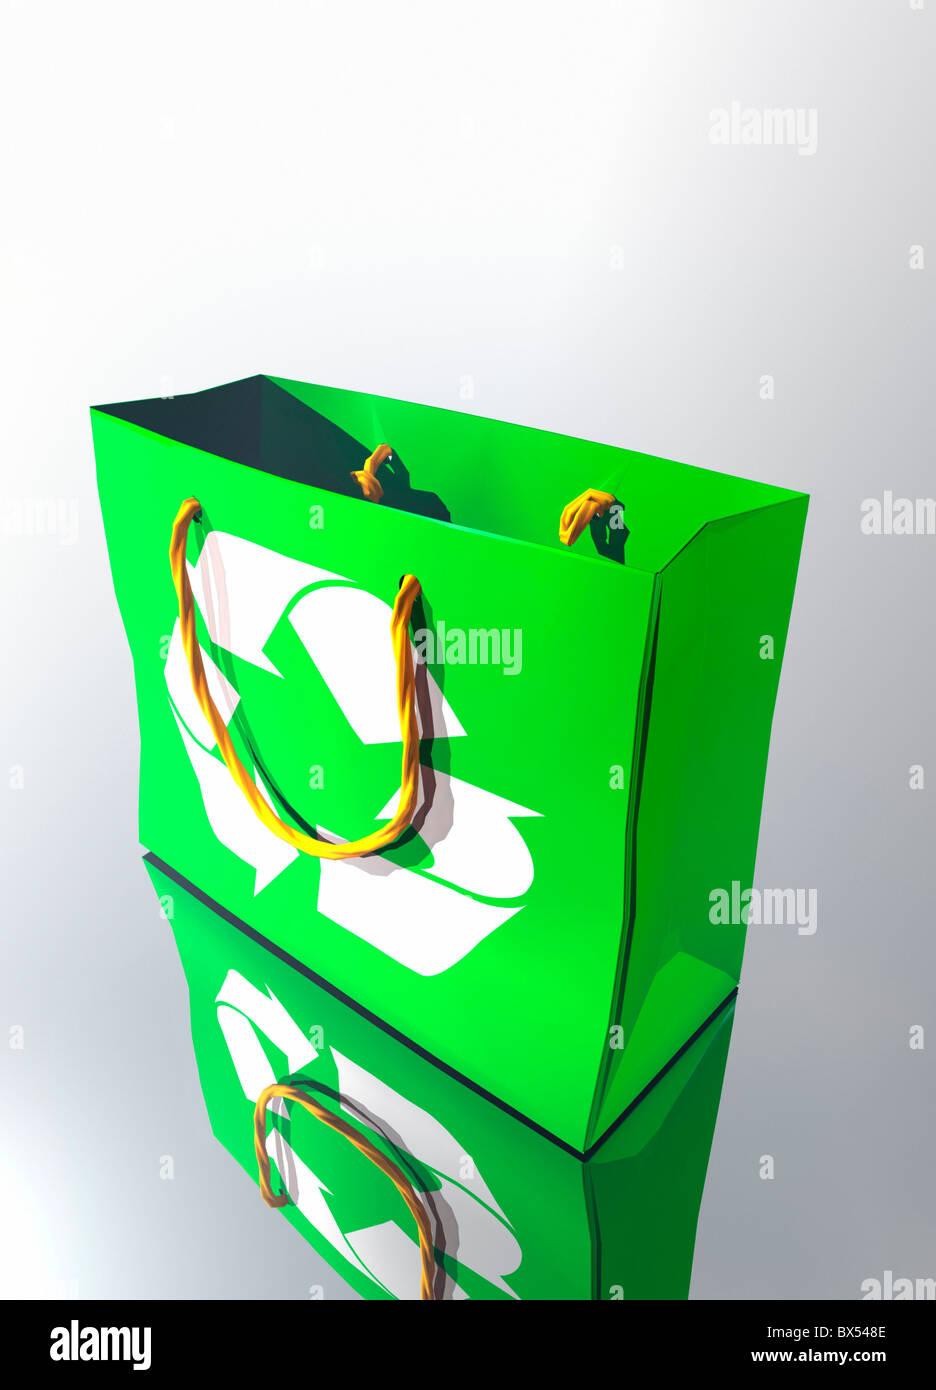 Reusable shopping bag, artwork - Stock Image